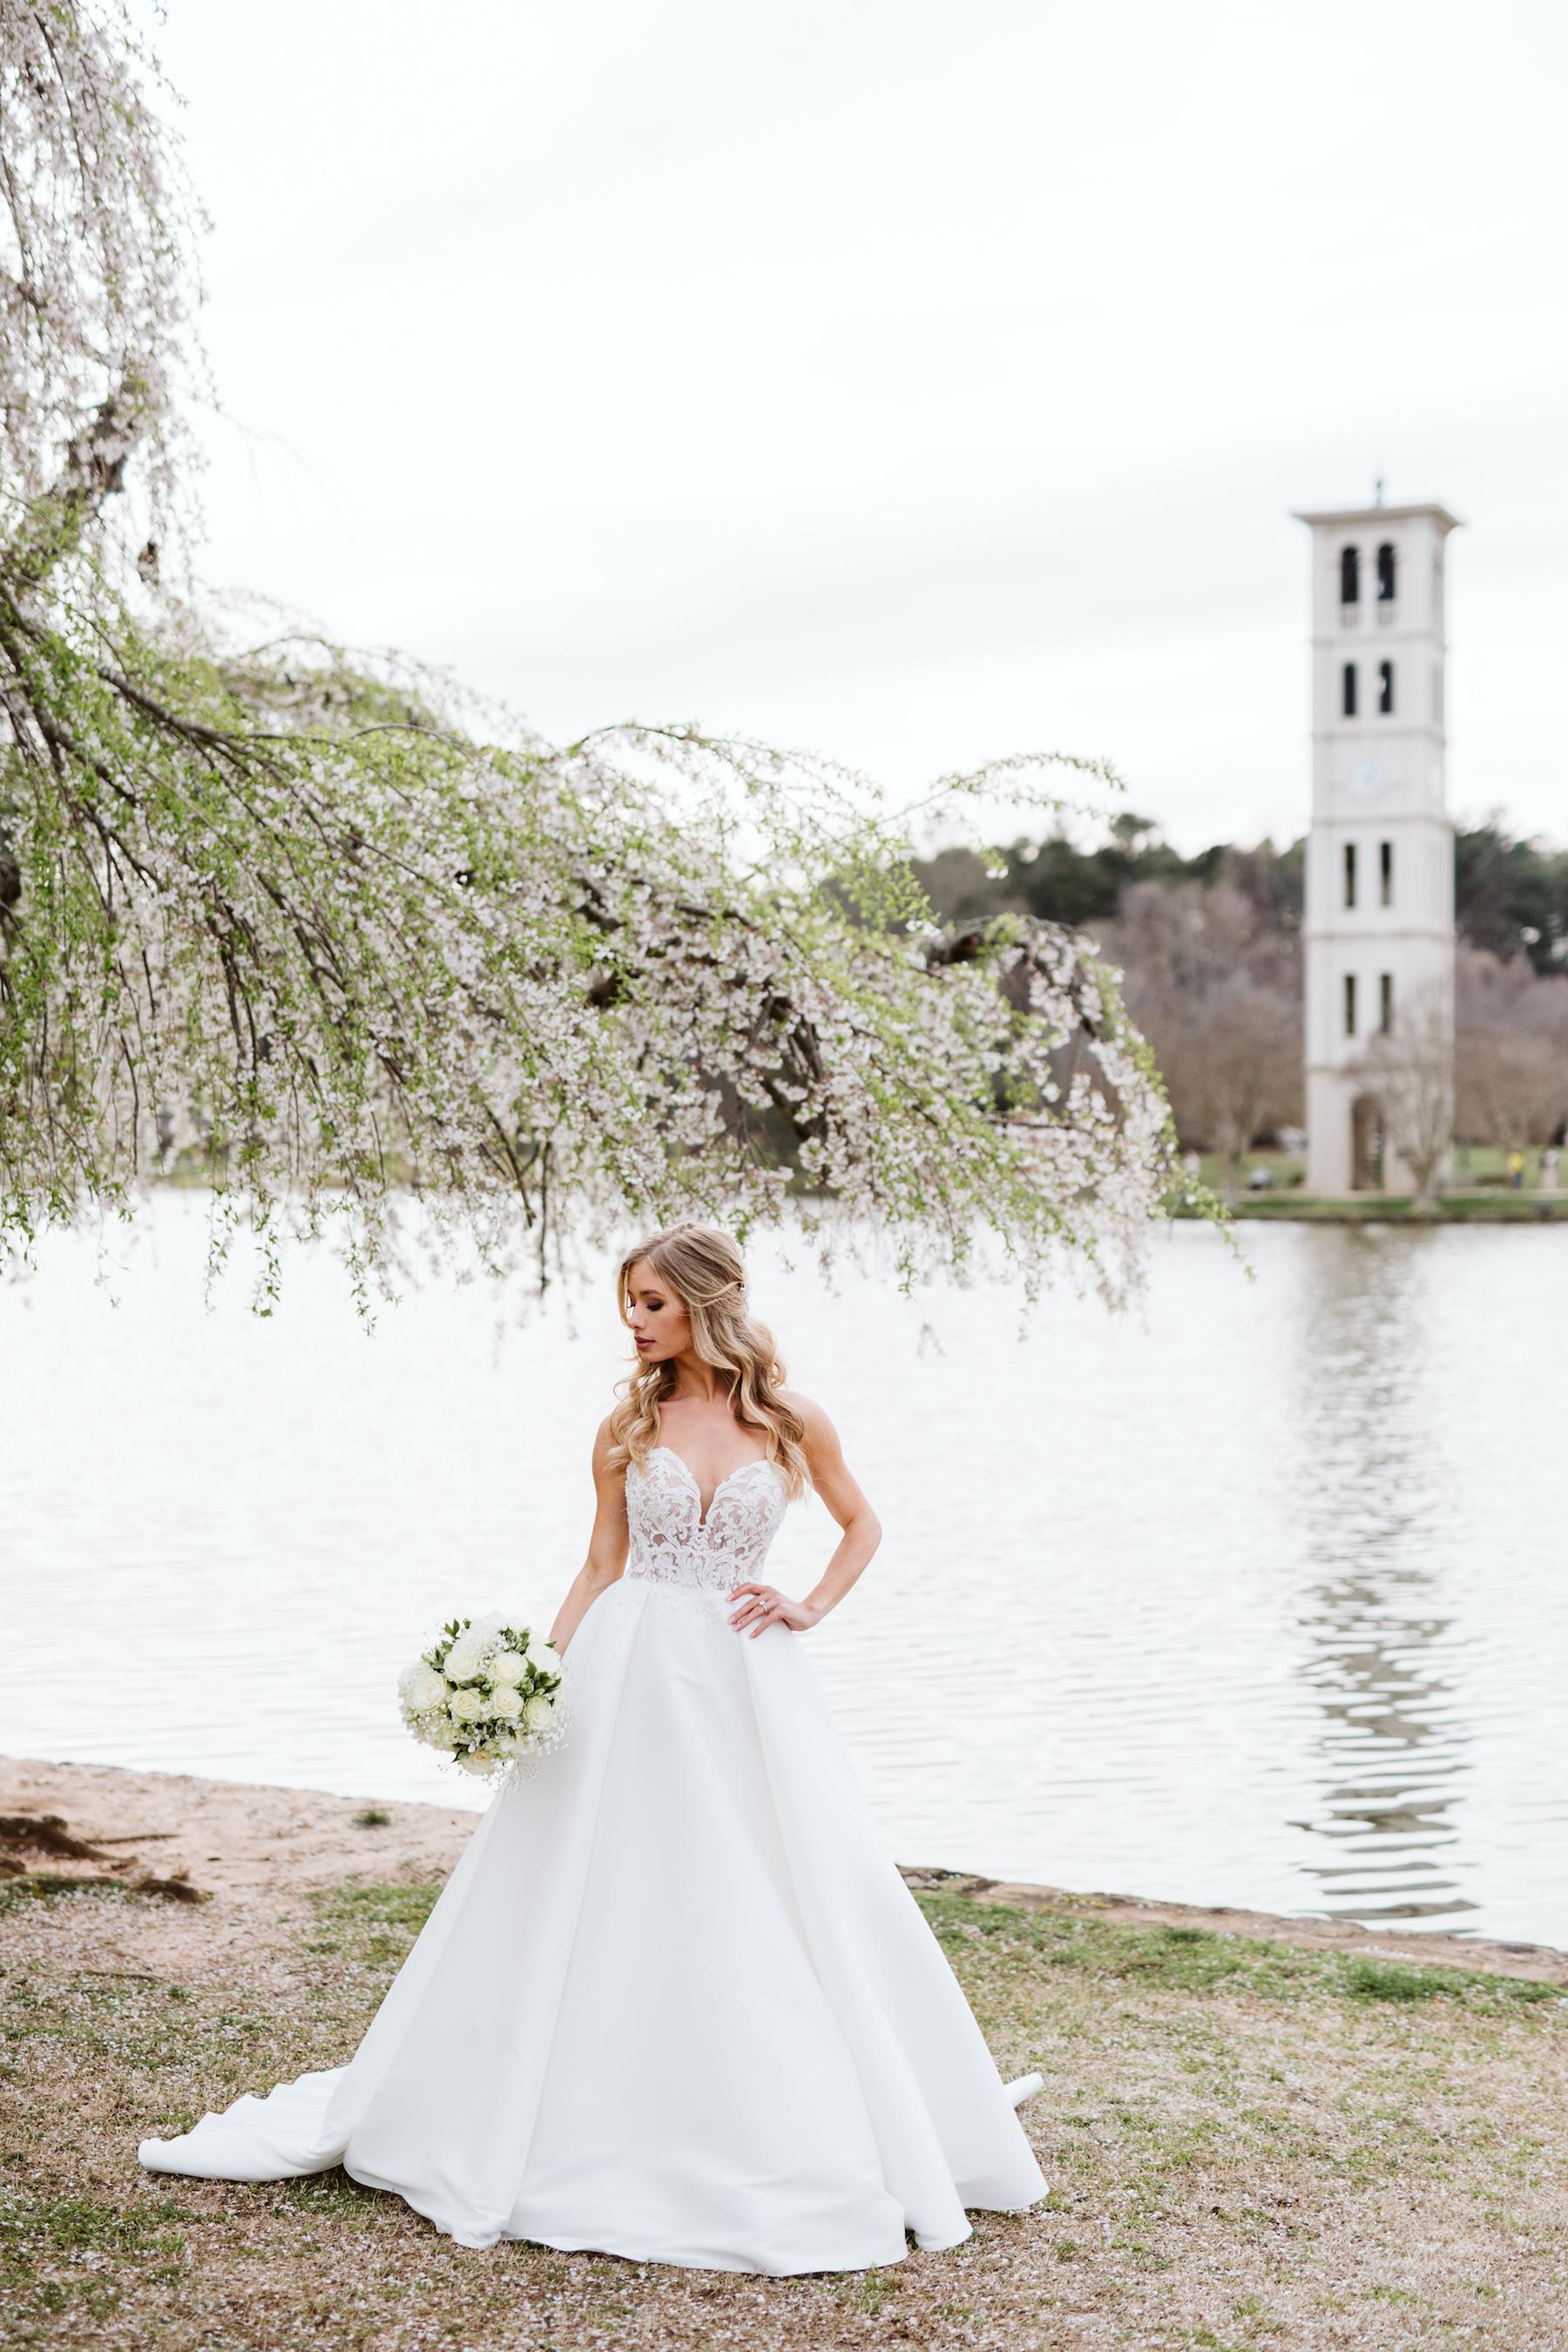 furman-university-bridals-paige-203.JPG